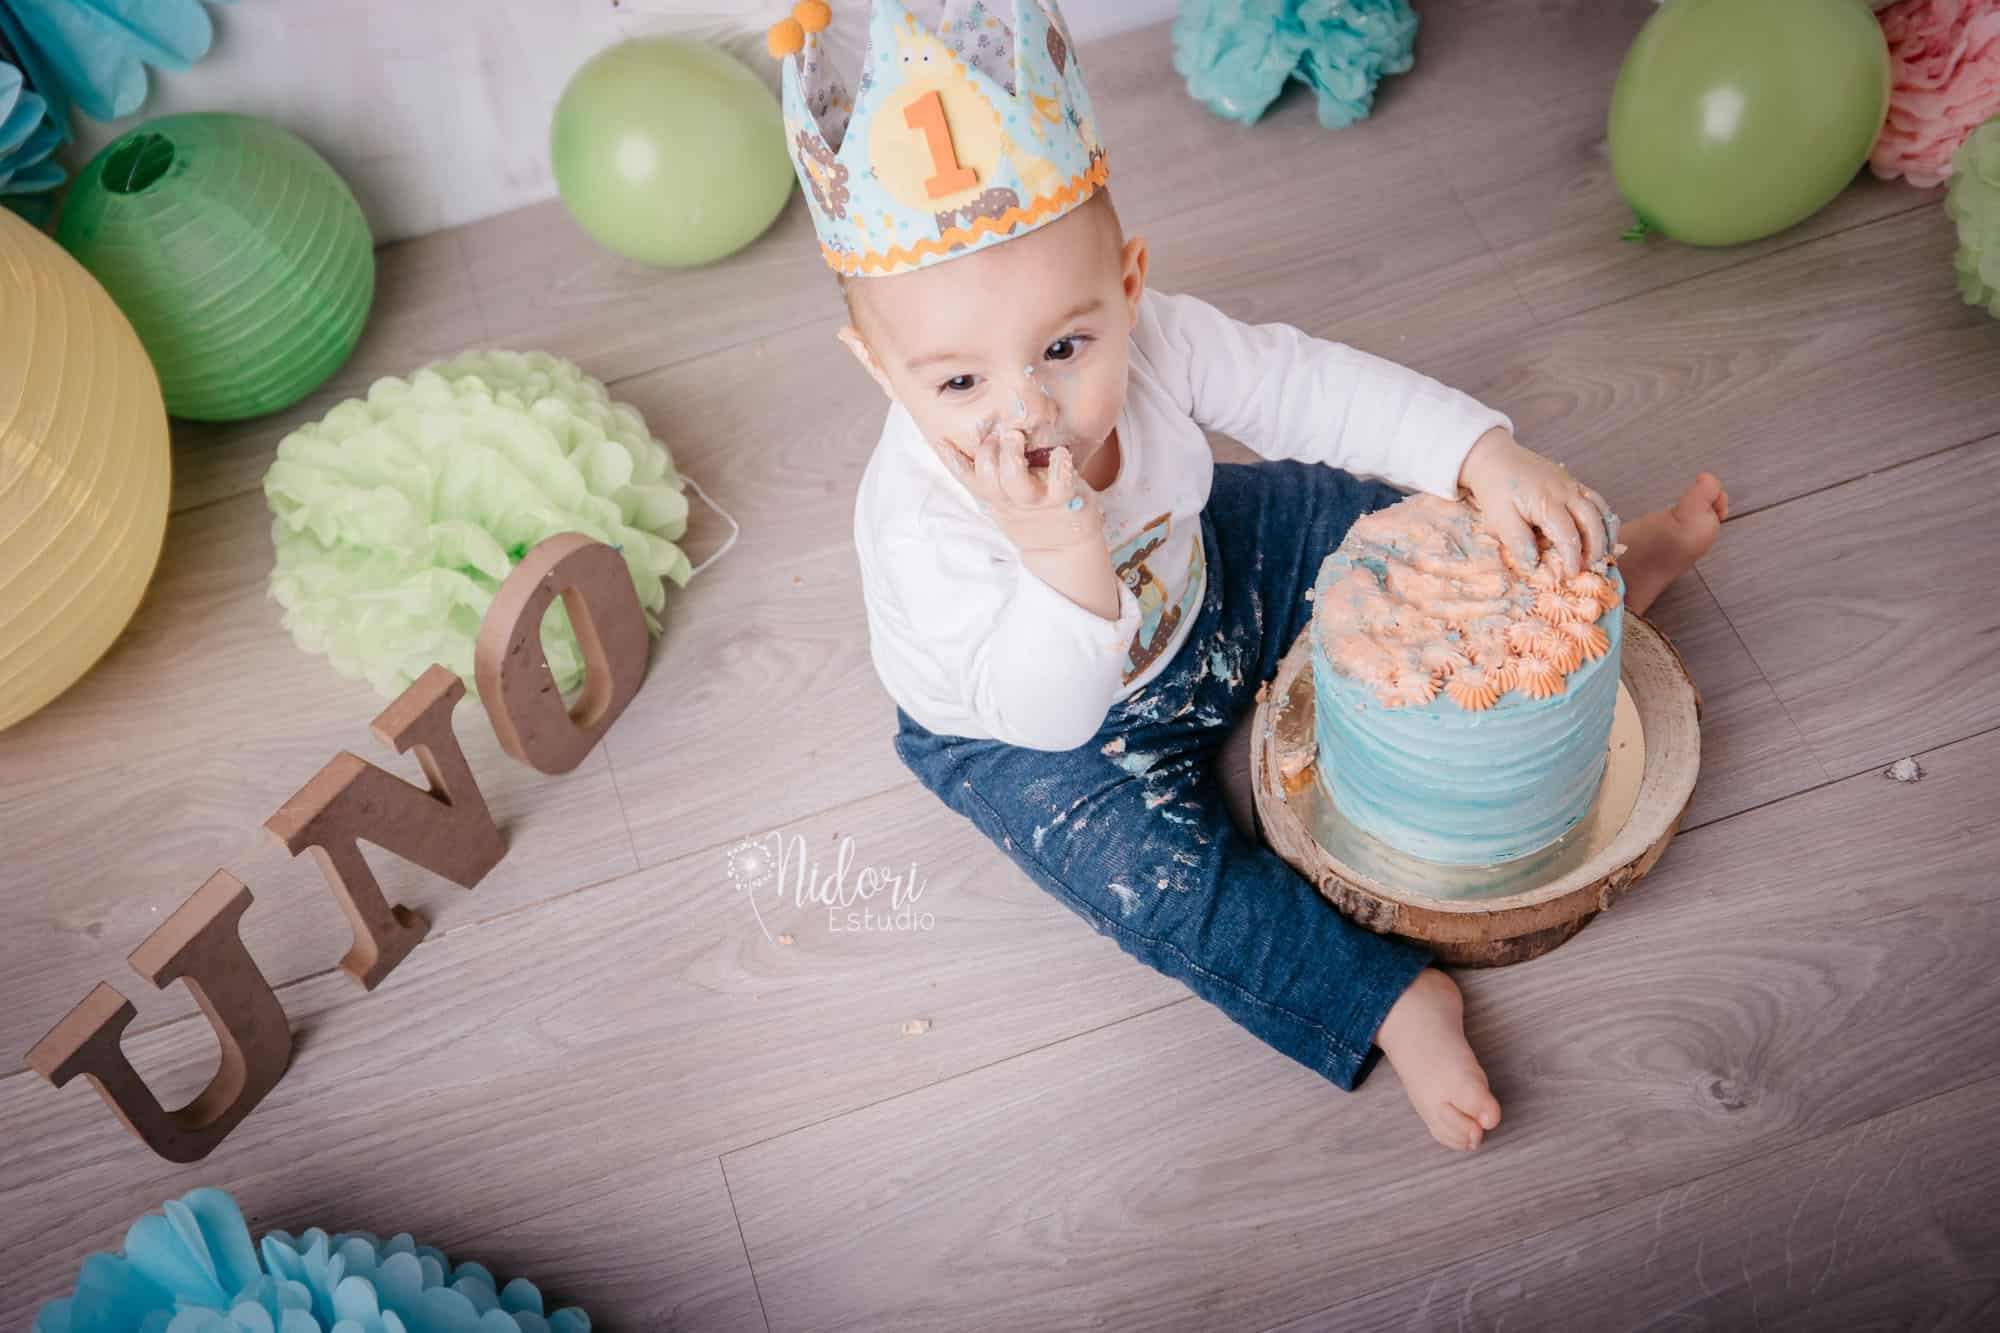 smash-cake-cumpleaños-tarta-fotografia-niños-bebes-nidoriestudio-fotos-valencia-almazora-castellon-españa-spain-17